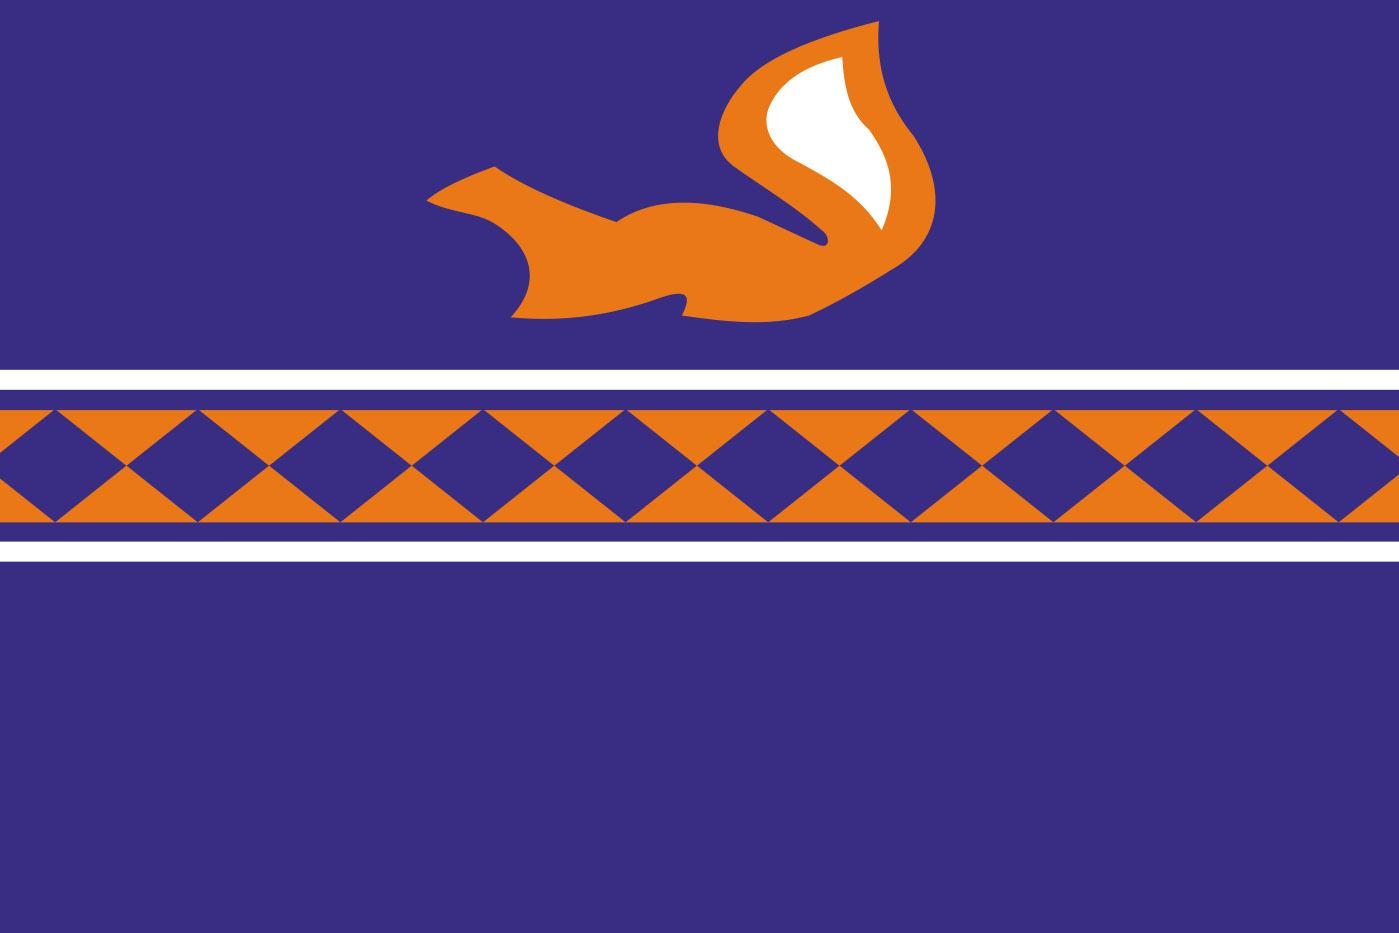 Флаг Пуровского района